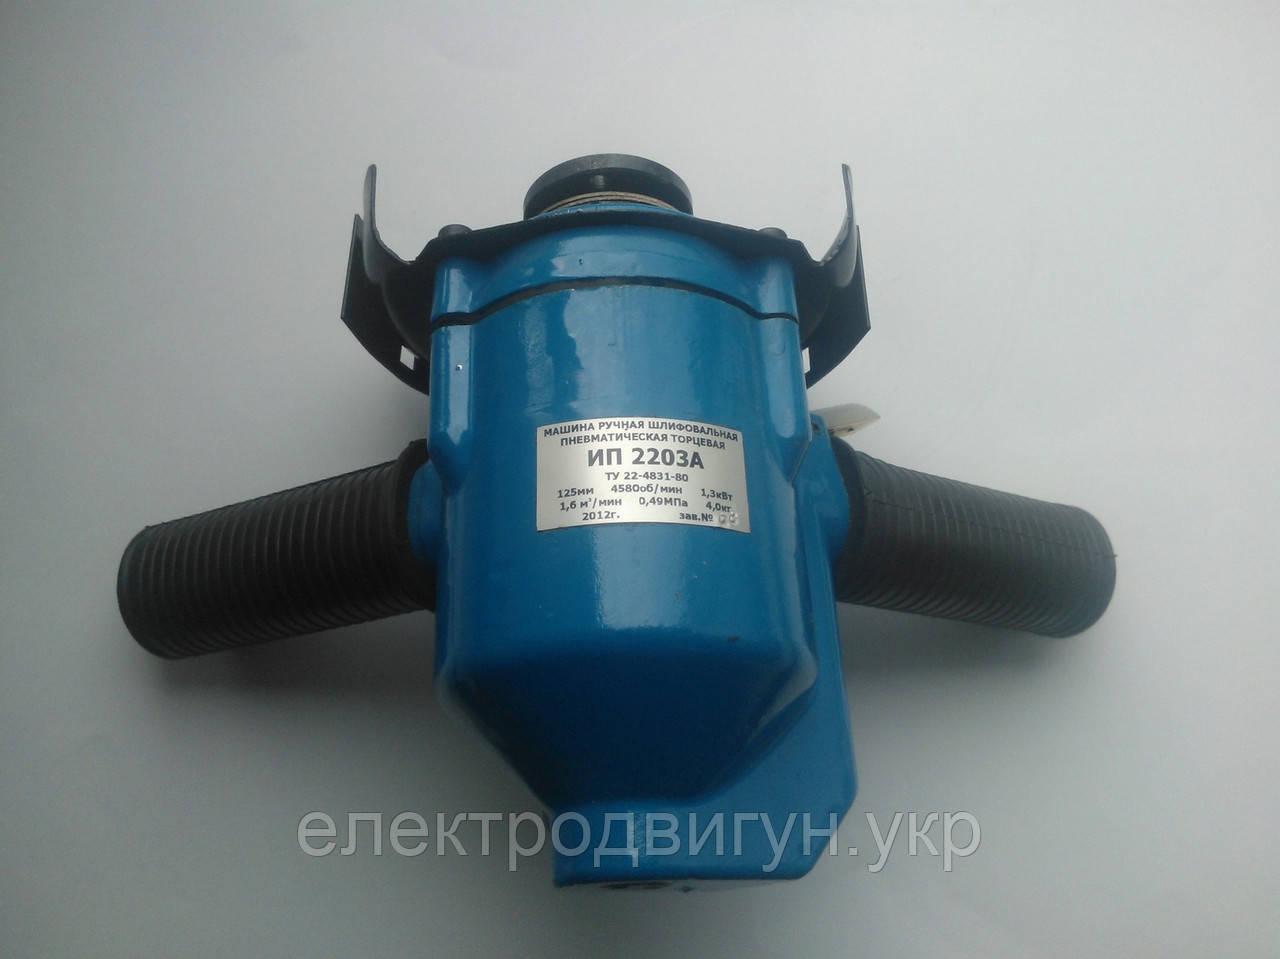 Машина шліфувальна пневматична ручна торцева ІП-2203